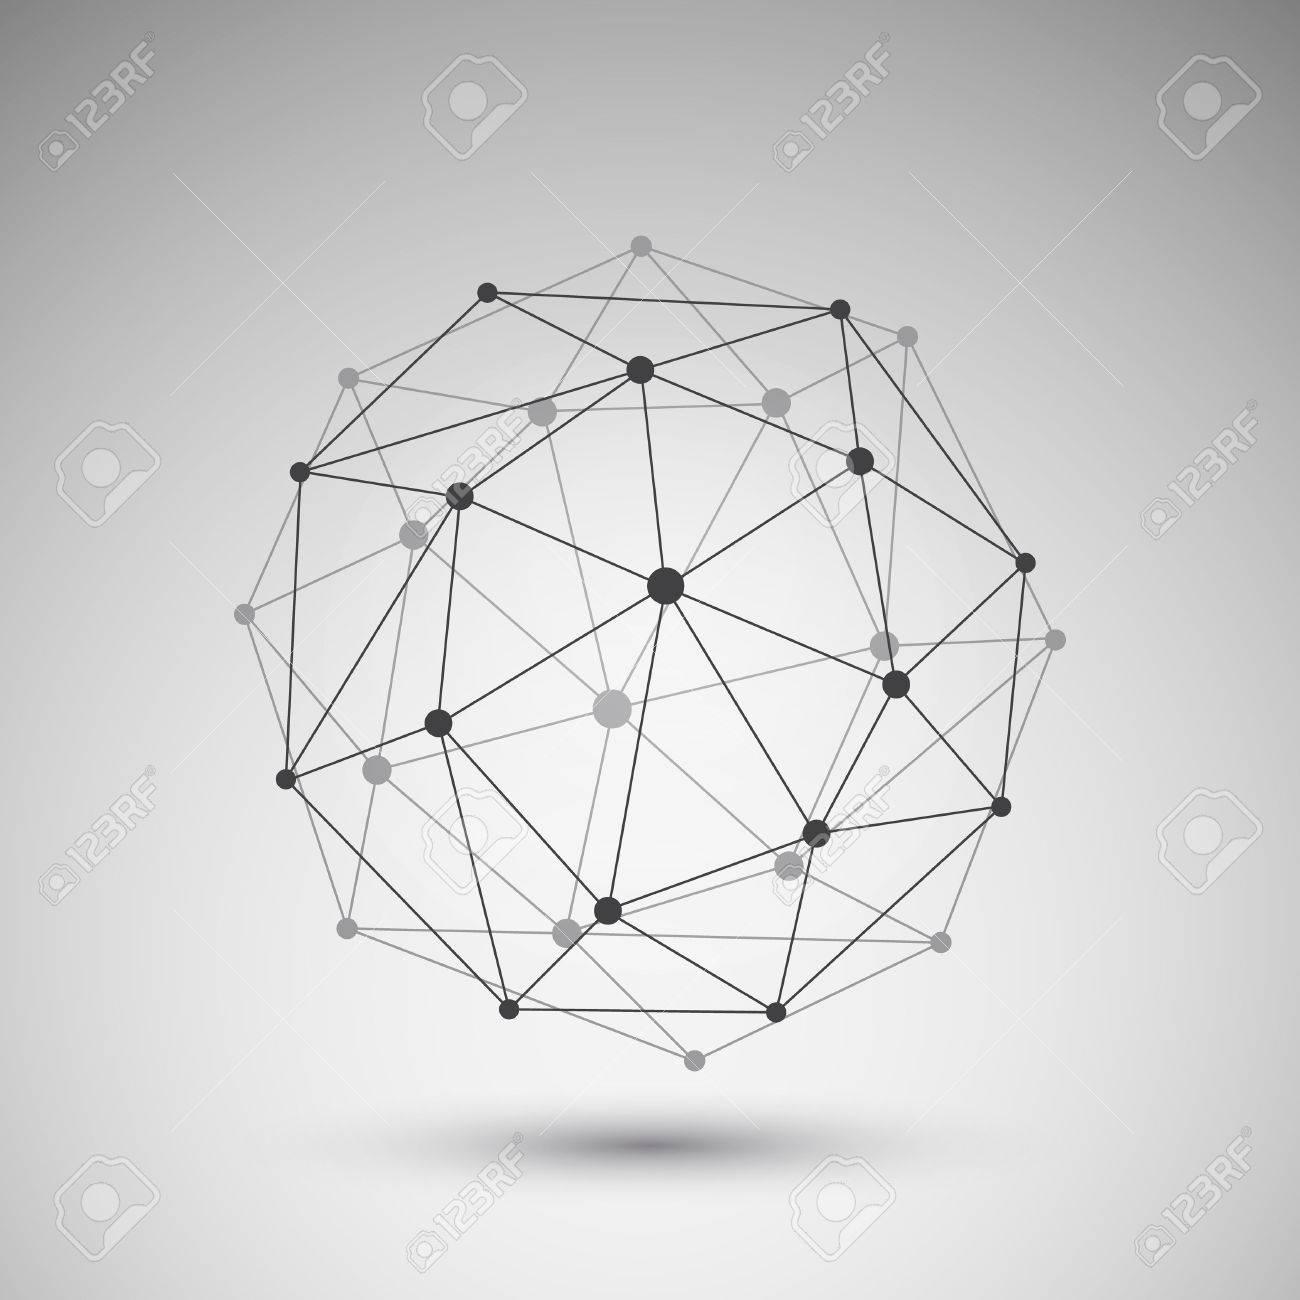 Networks Globe Design - 39938129